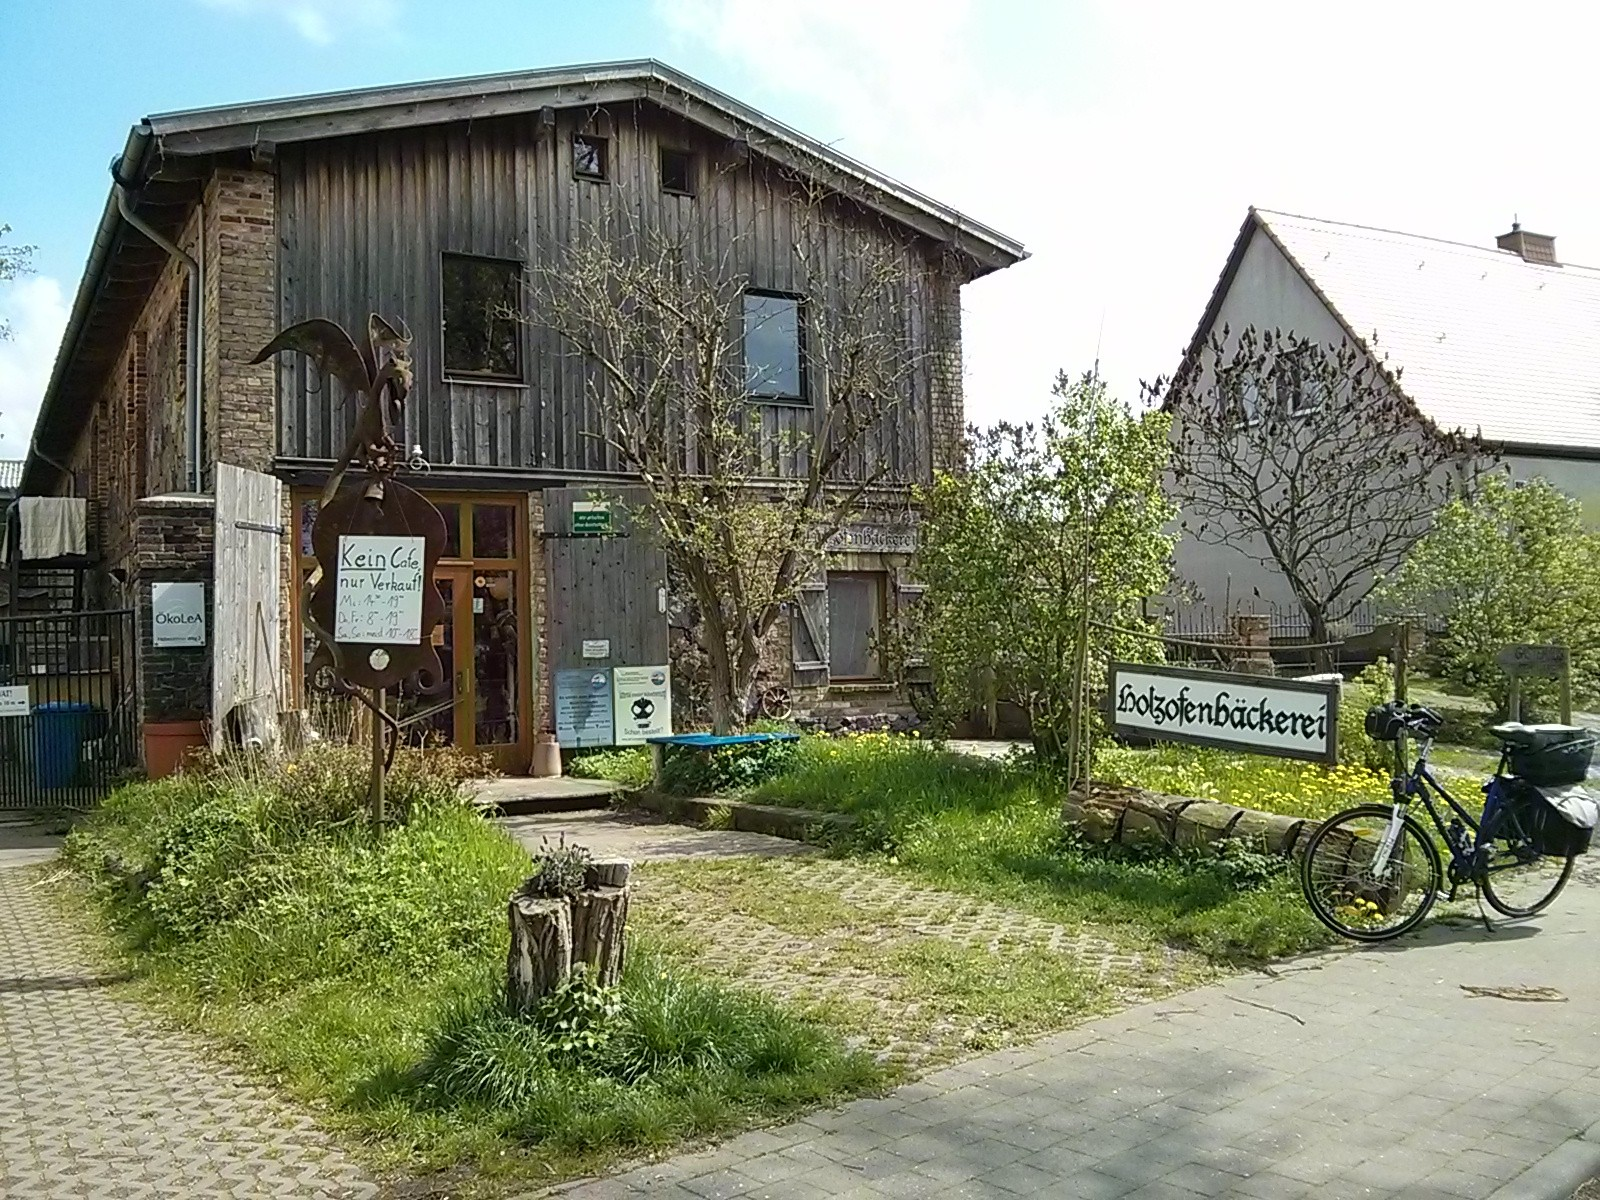 Holzofenbäckerei Klosterdorf